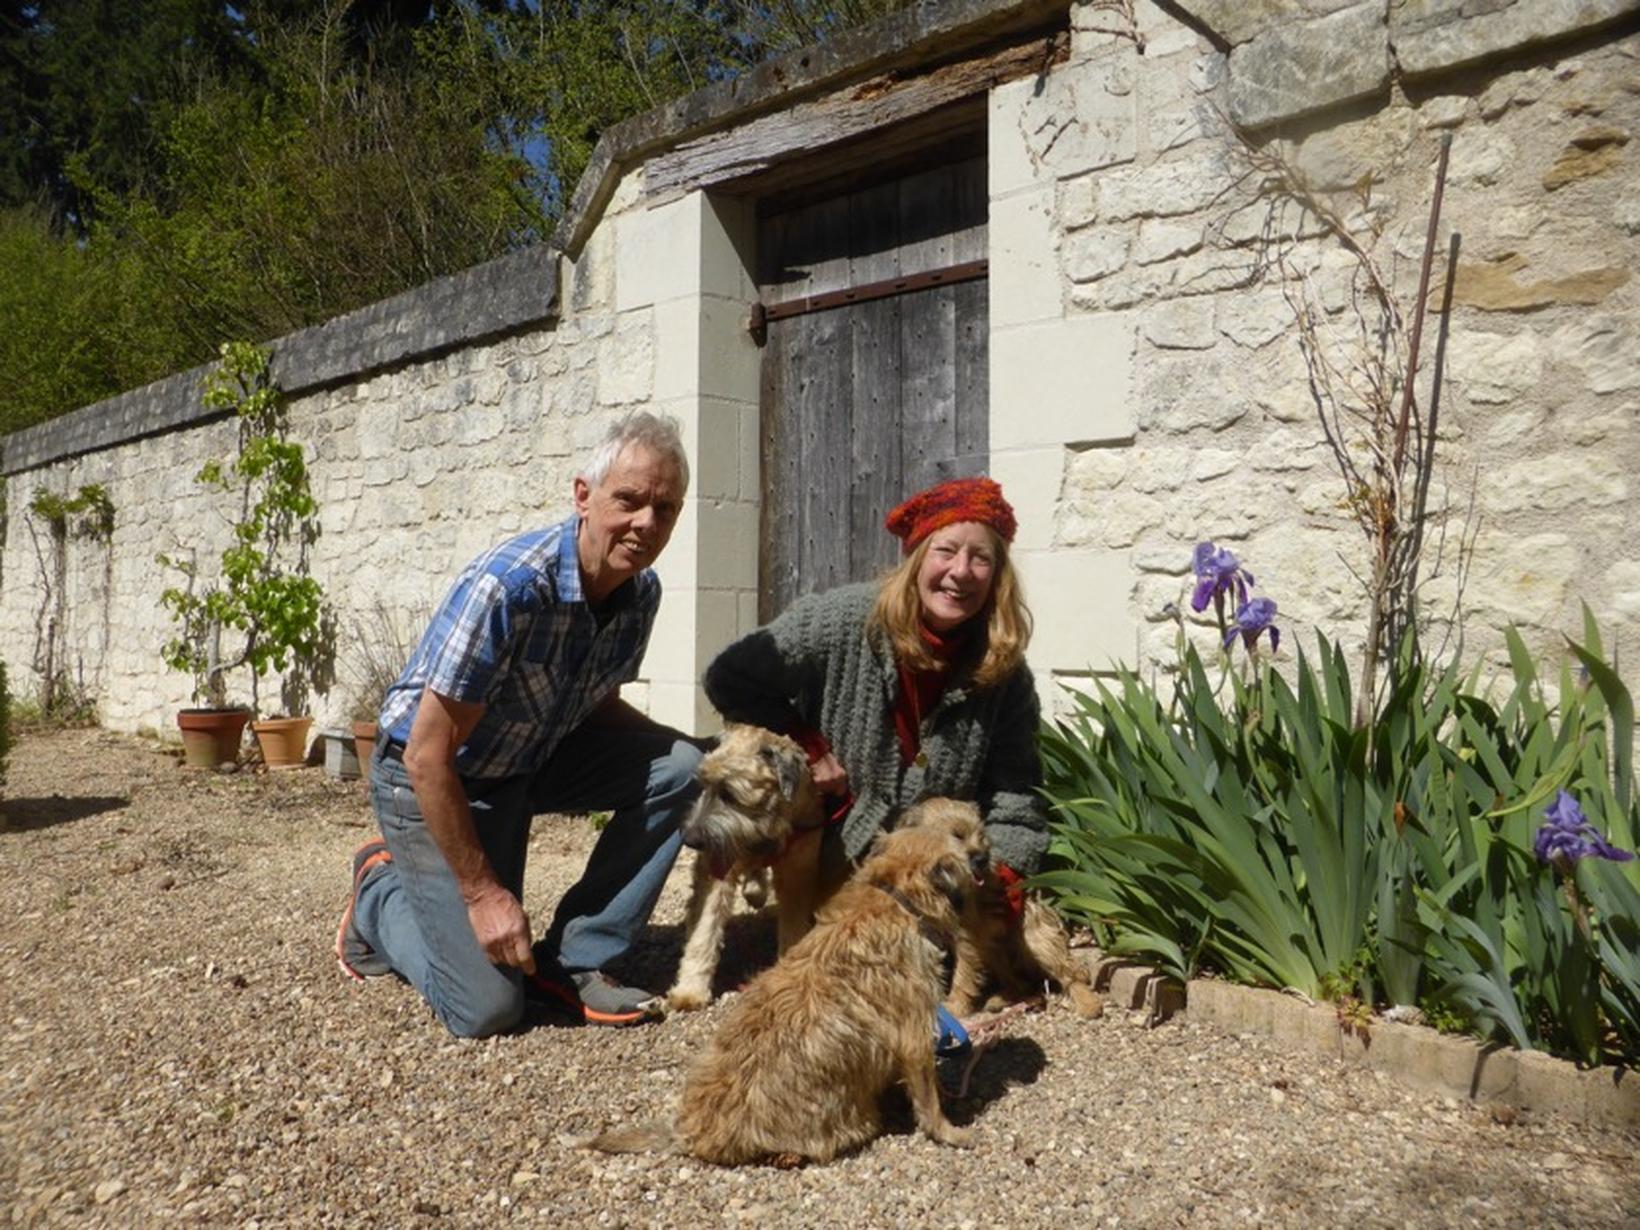 Jane & Angus from Malborough, United Kingdom